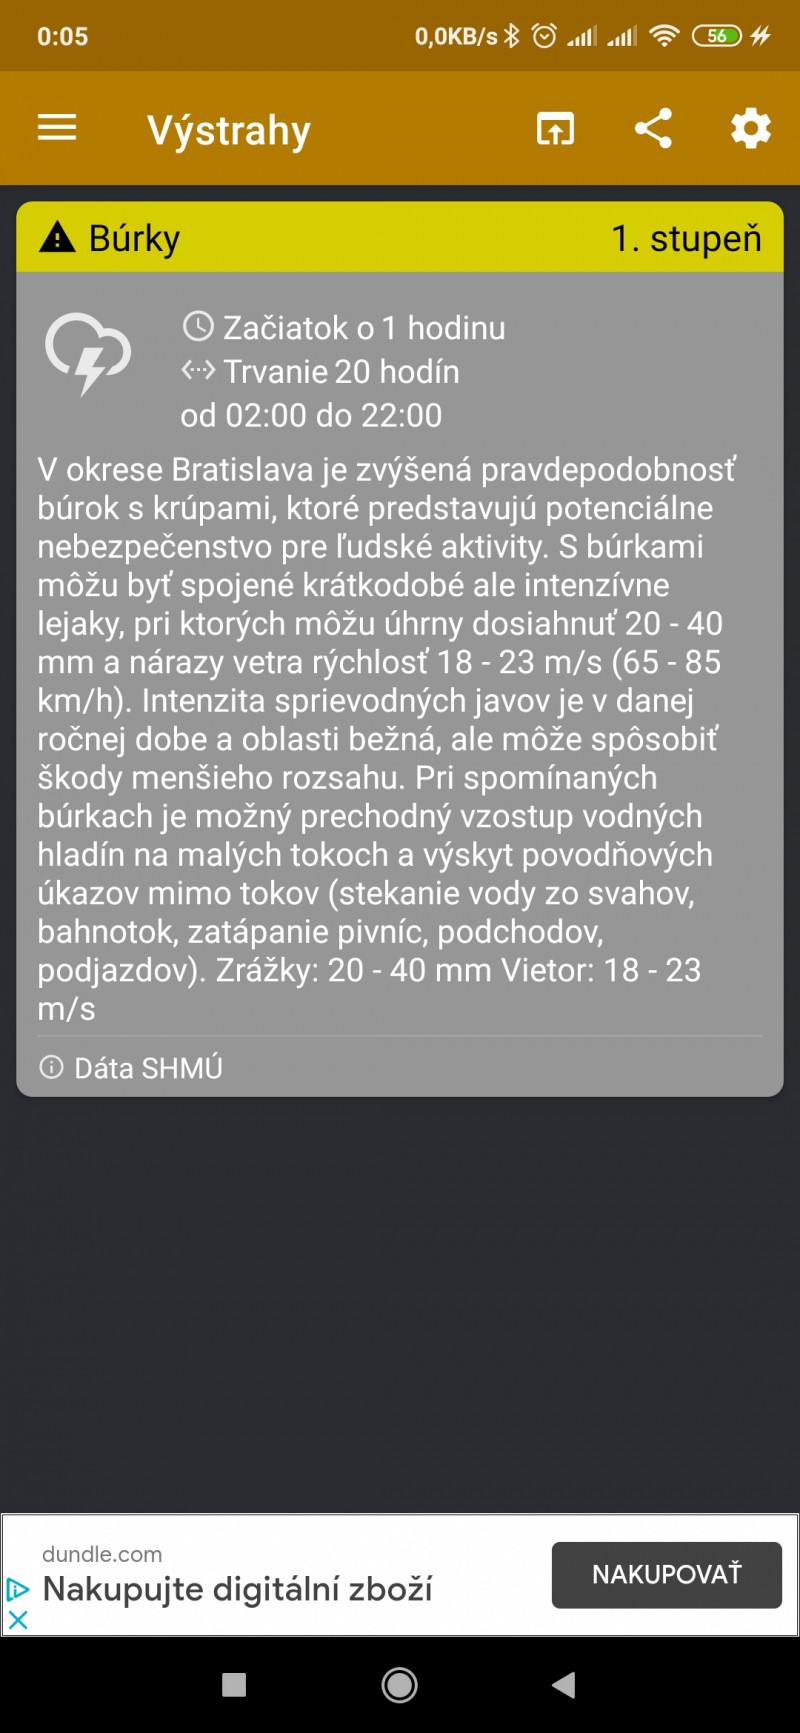 Screenshot_2021-07-17-00-05-22-127_sk.earendil.shmuapp.jpg